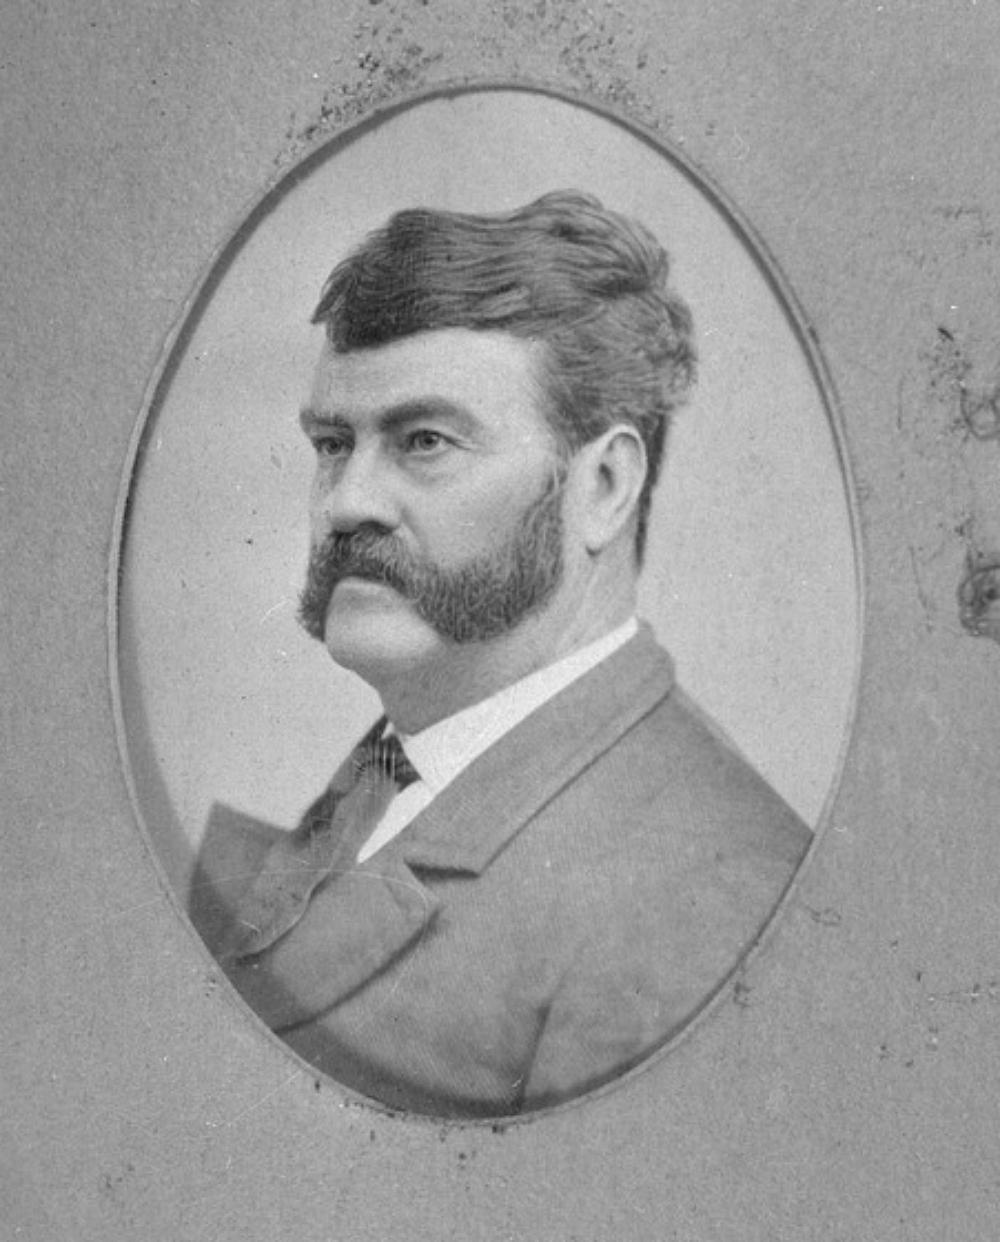 1860s man with facial hair